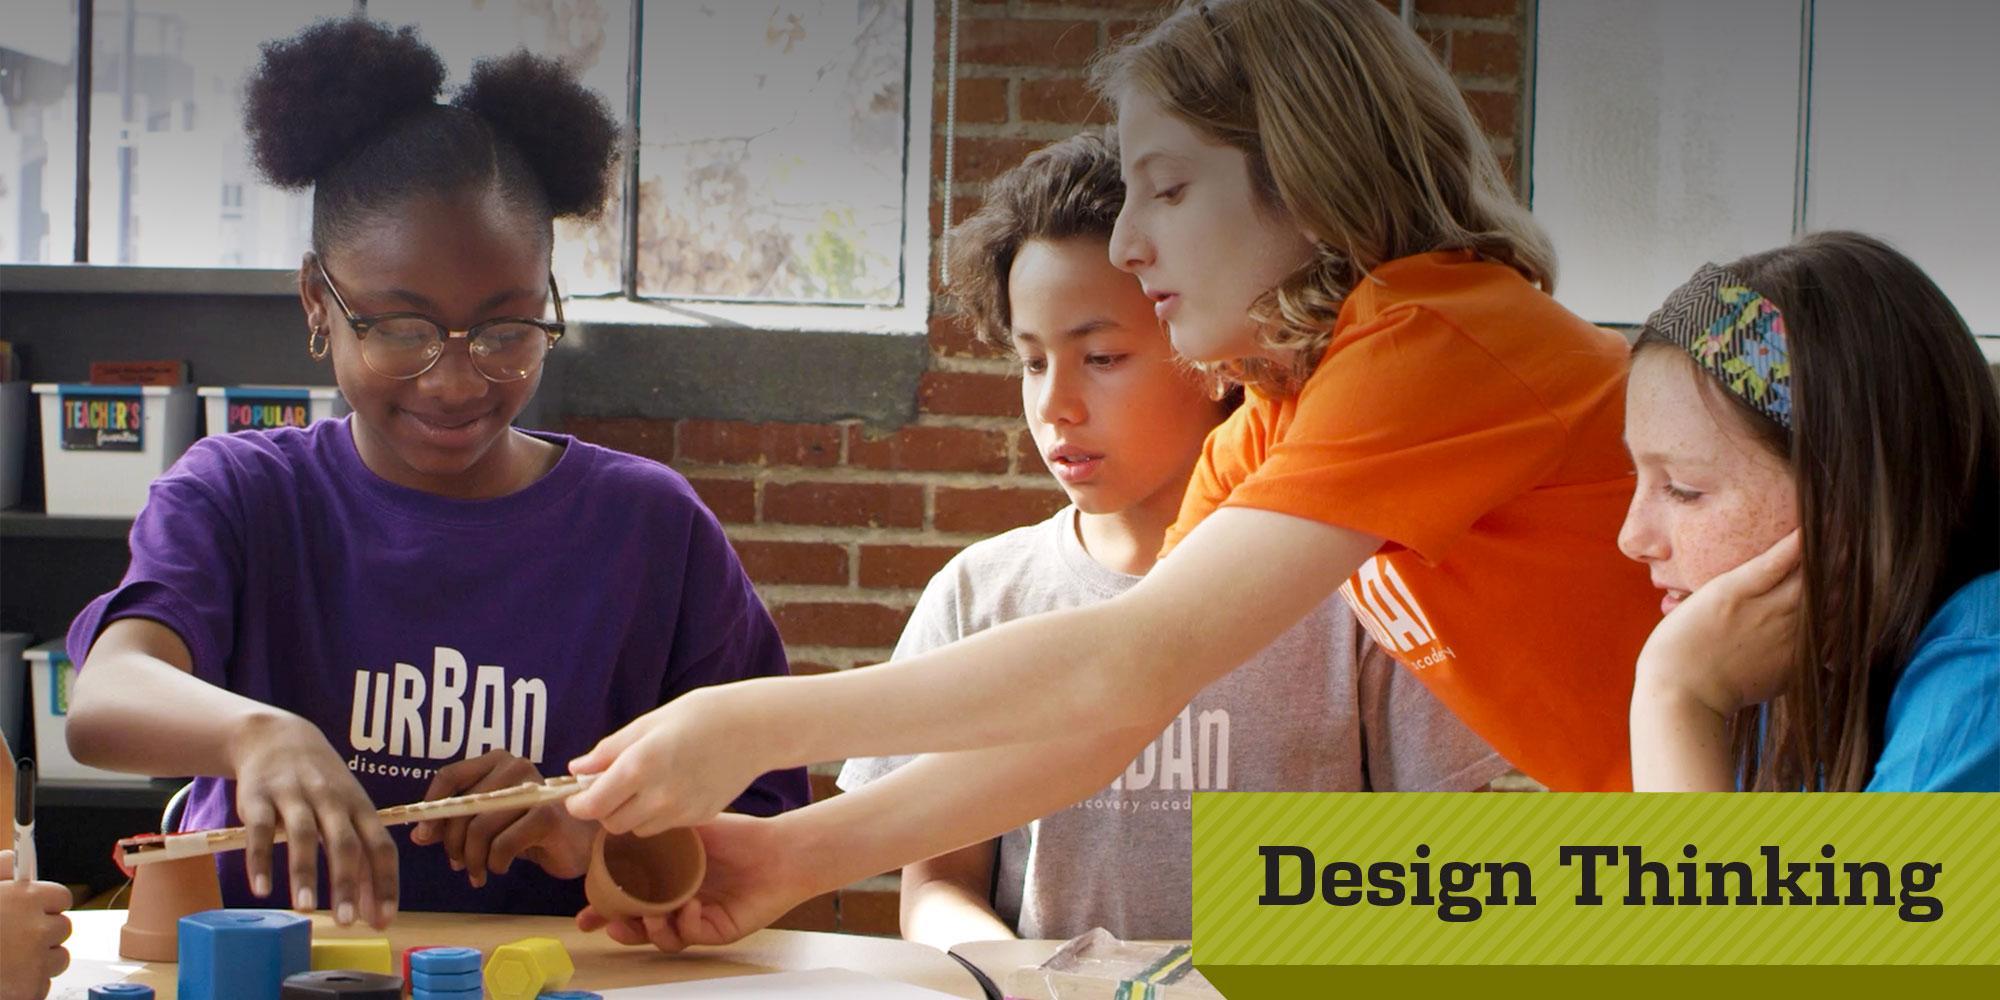 Urban Discovery School - Design Thinking